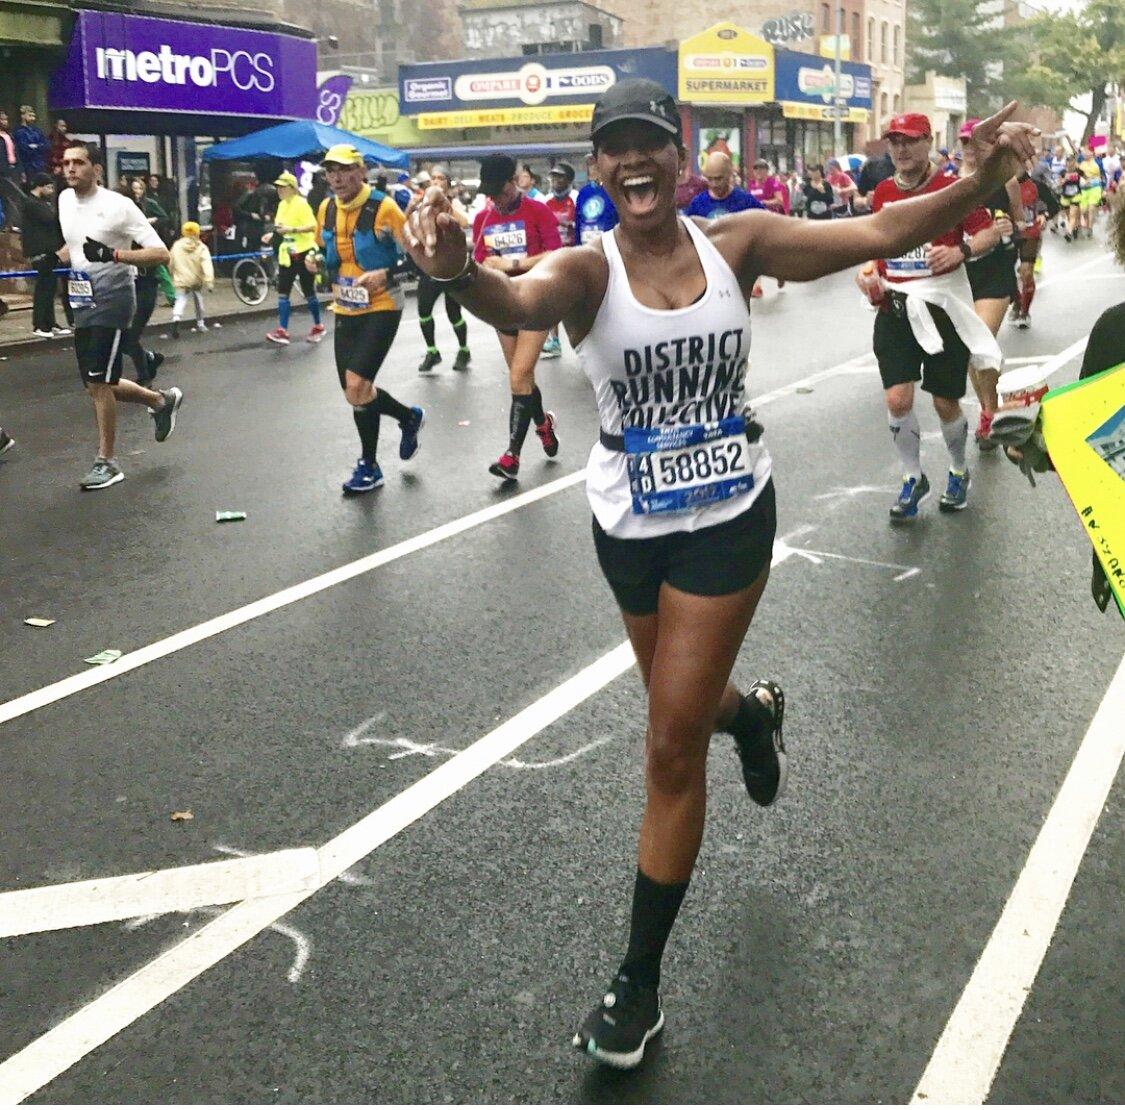 Ashlee running through her cheer squad at the 2017 TCS New York City Marathon.